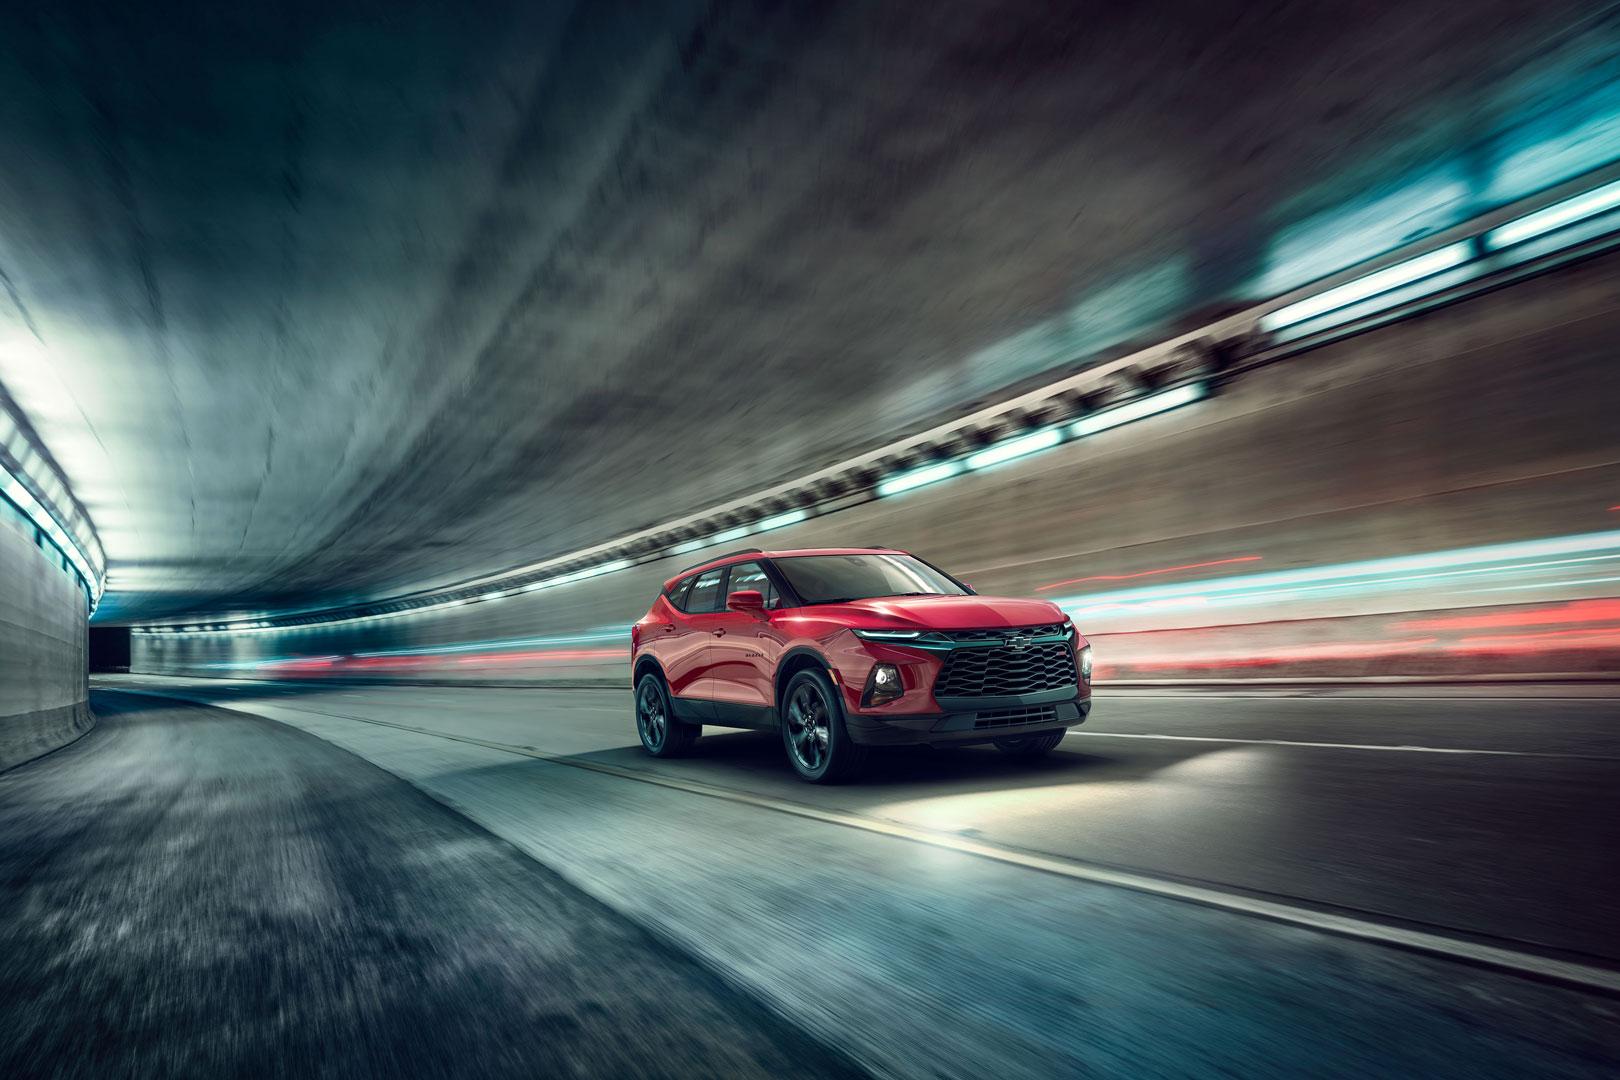 2019 Chevrolet Blazer press photo